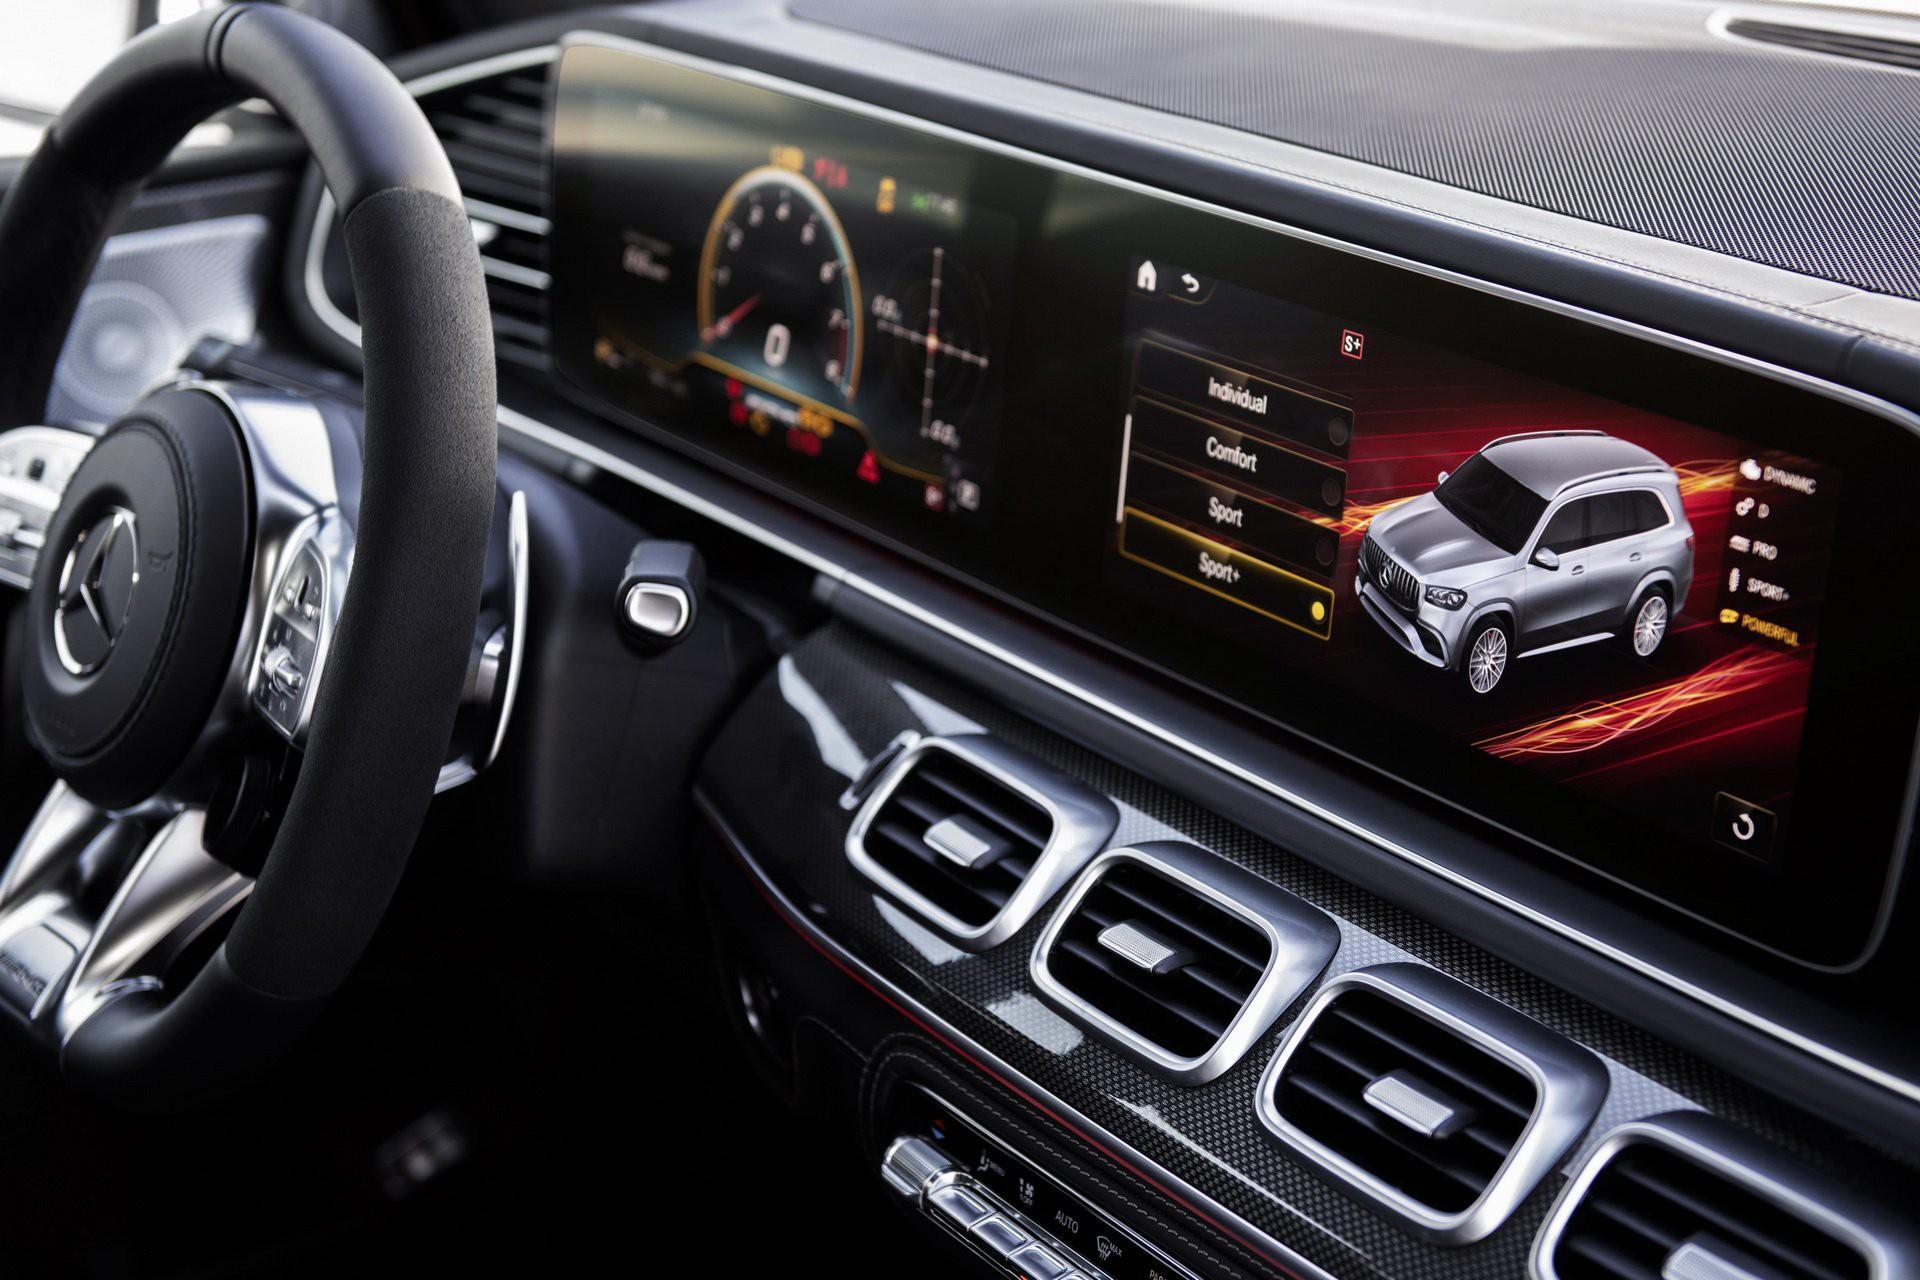 Khám phá Mercedes GLS 63 2020 vừa ra mắt Ảnh 11